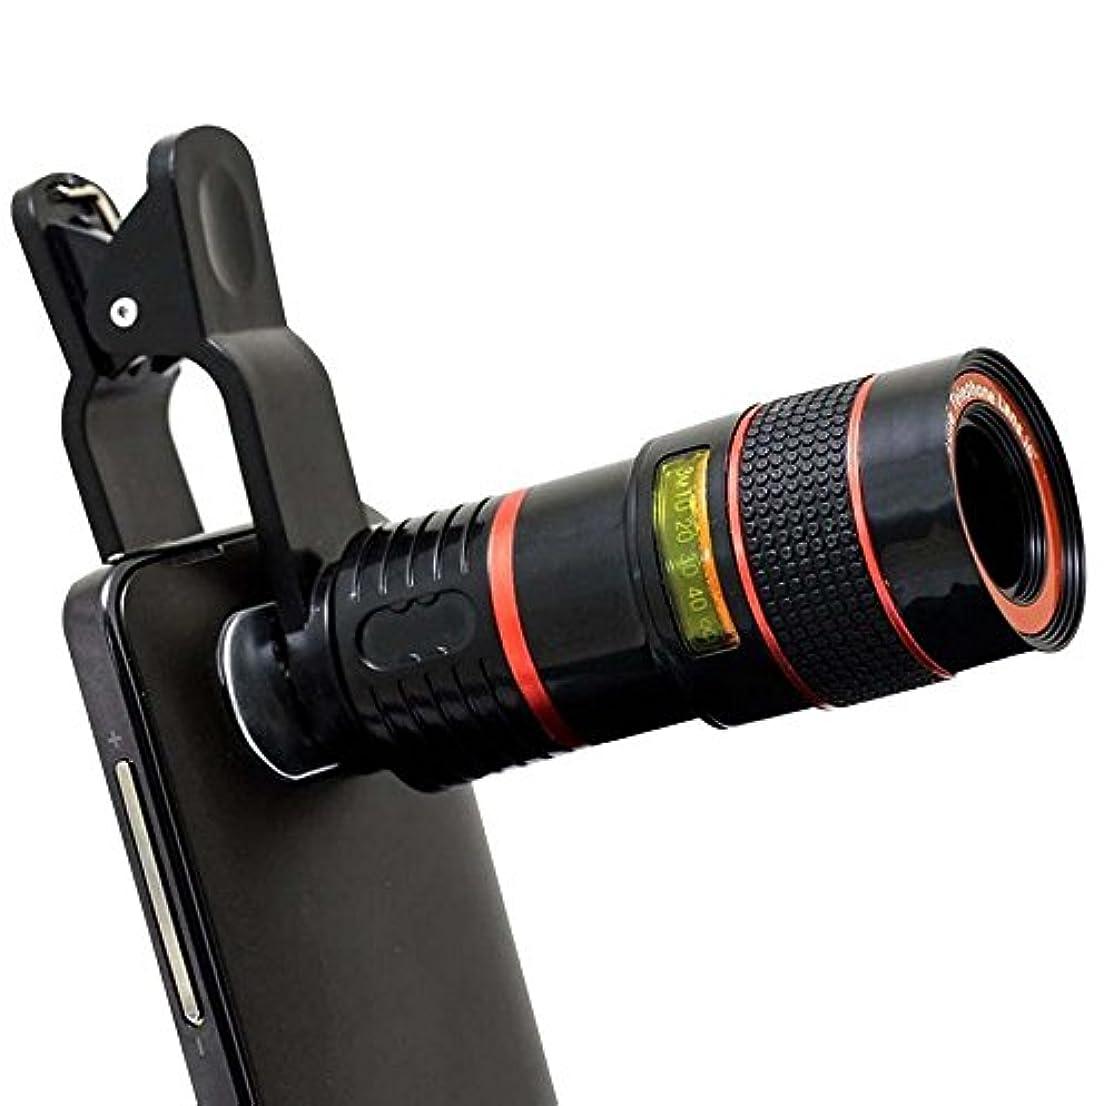 Ocamo 8X Zoom Magnifier Optical Telescope Camera Mobile Phone Lens with Clip Black